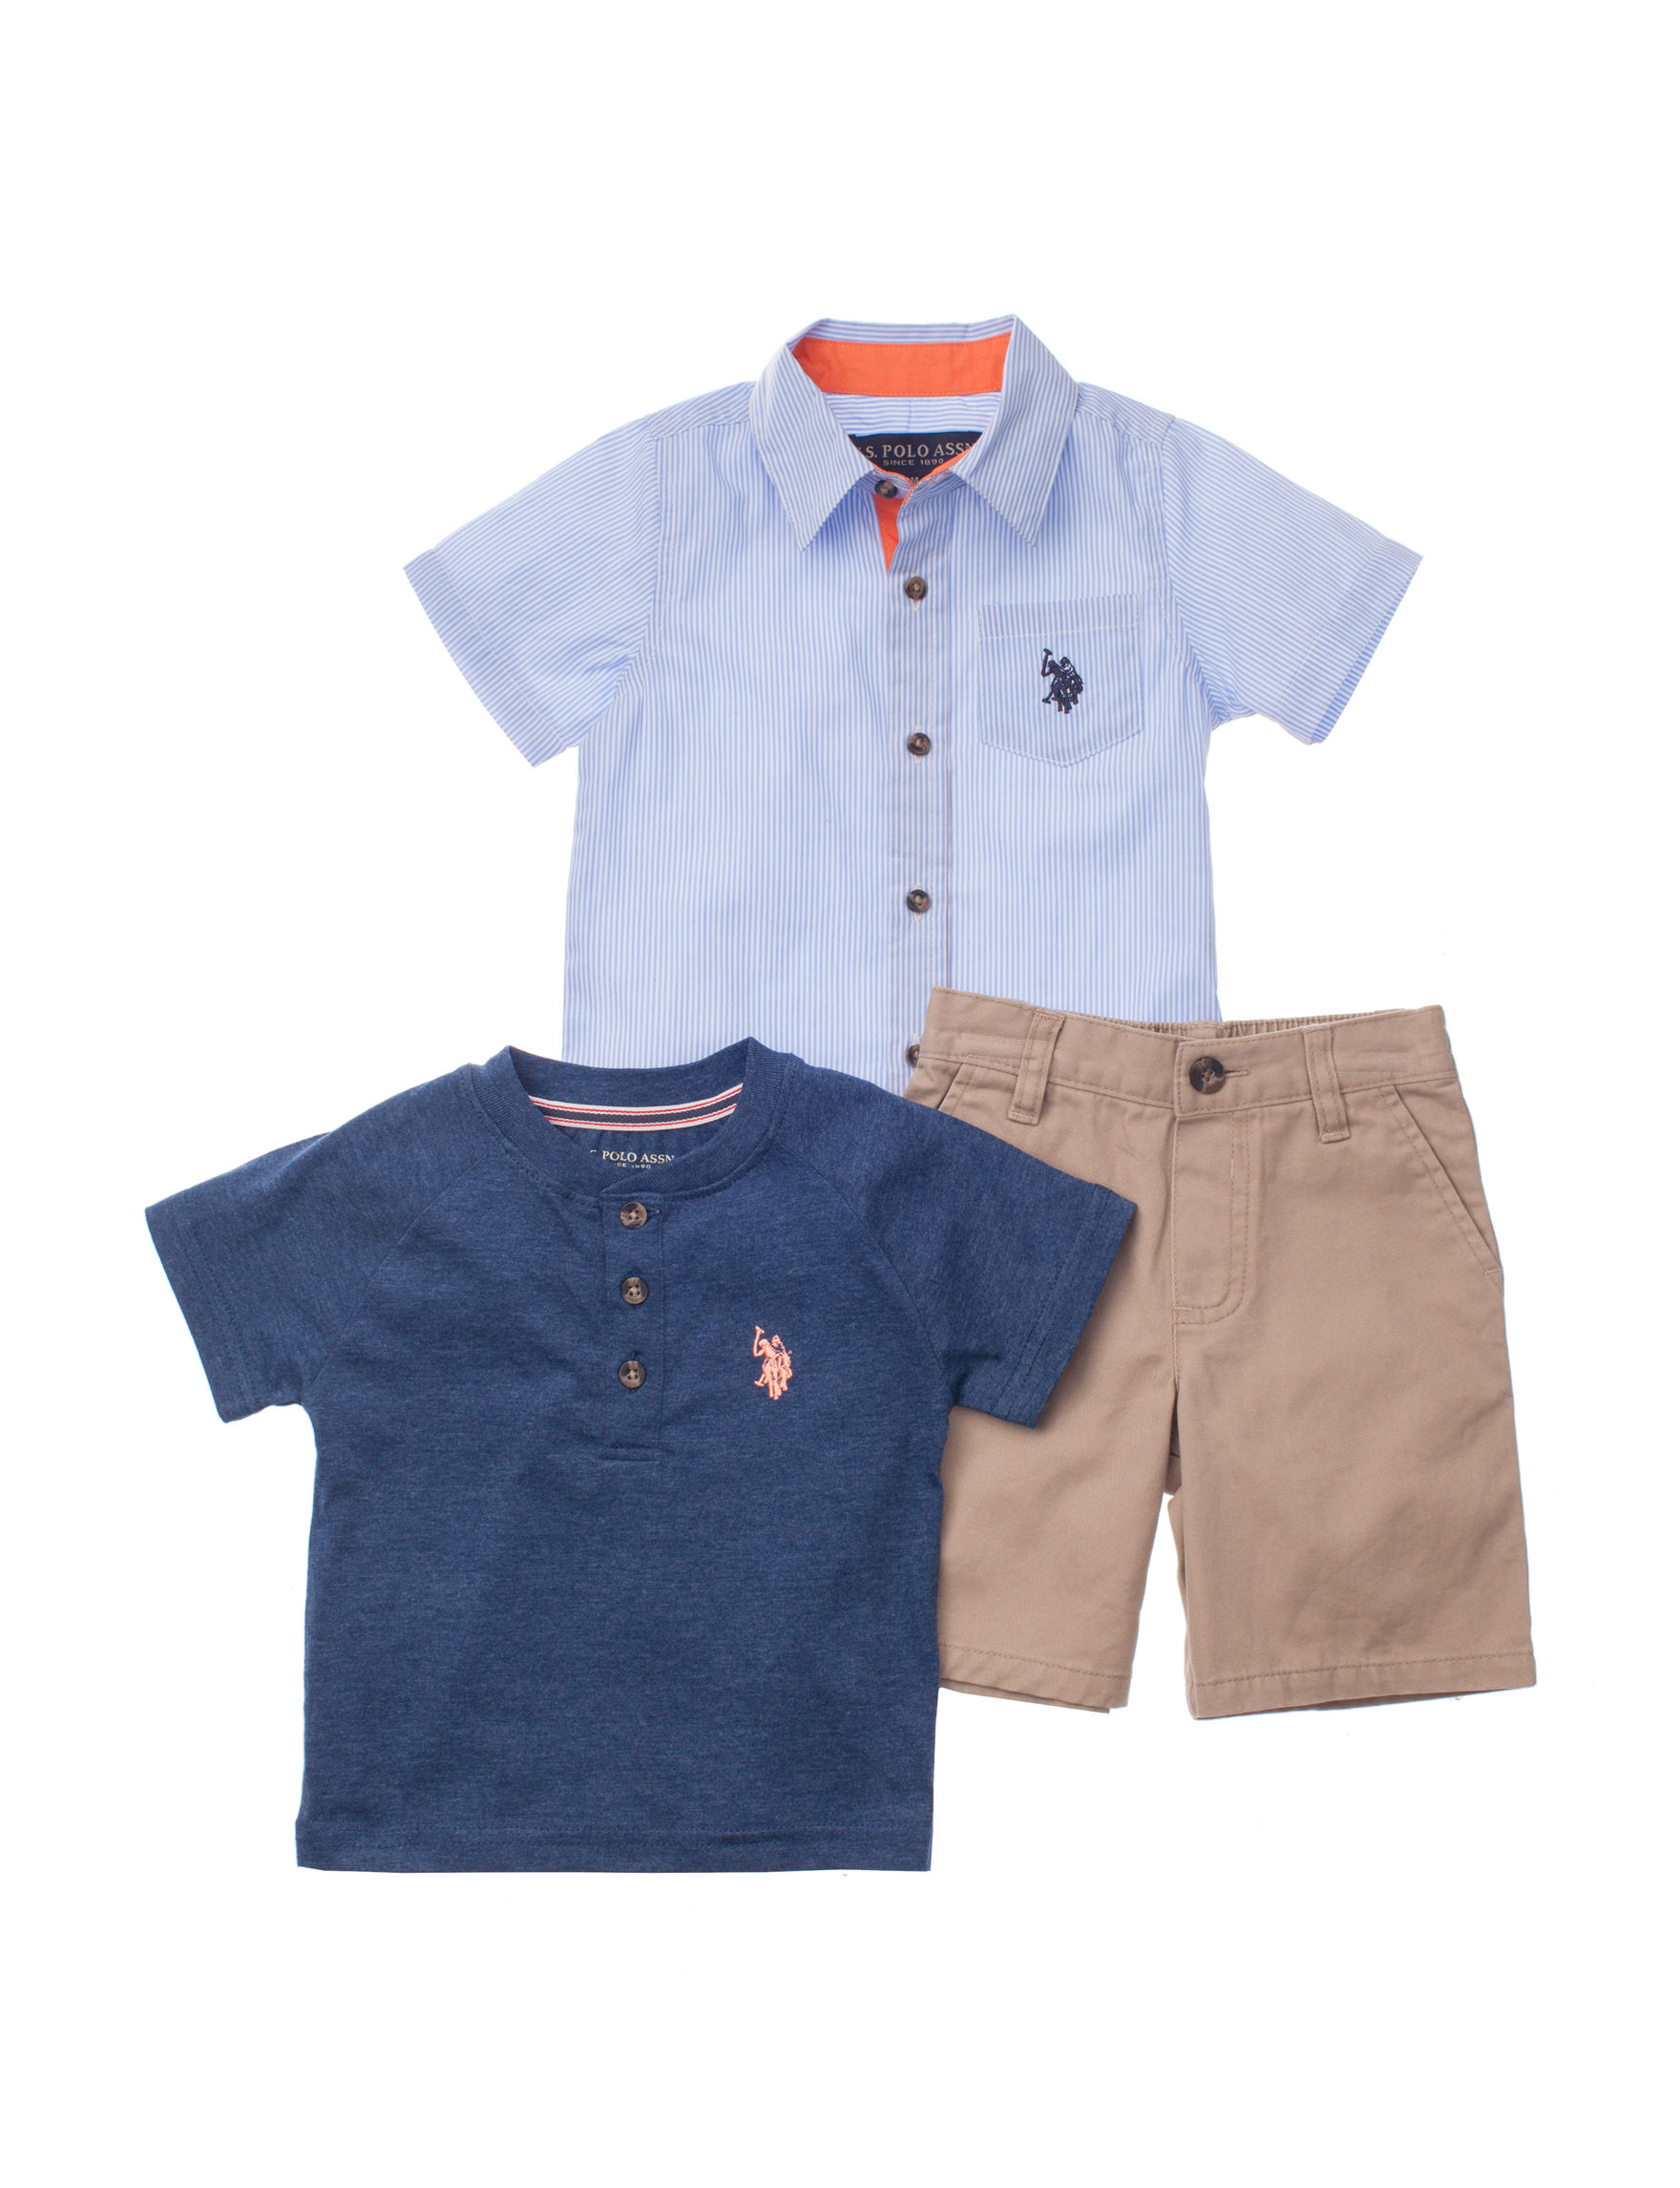 U.S. Polo Assn. Blue / White